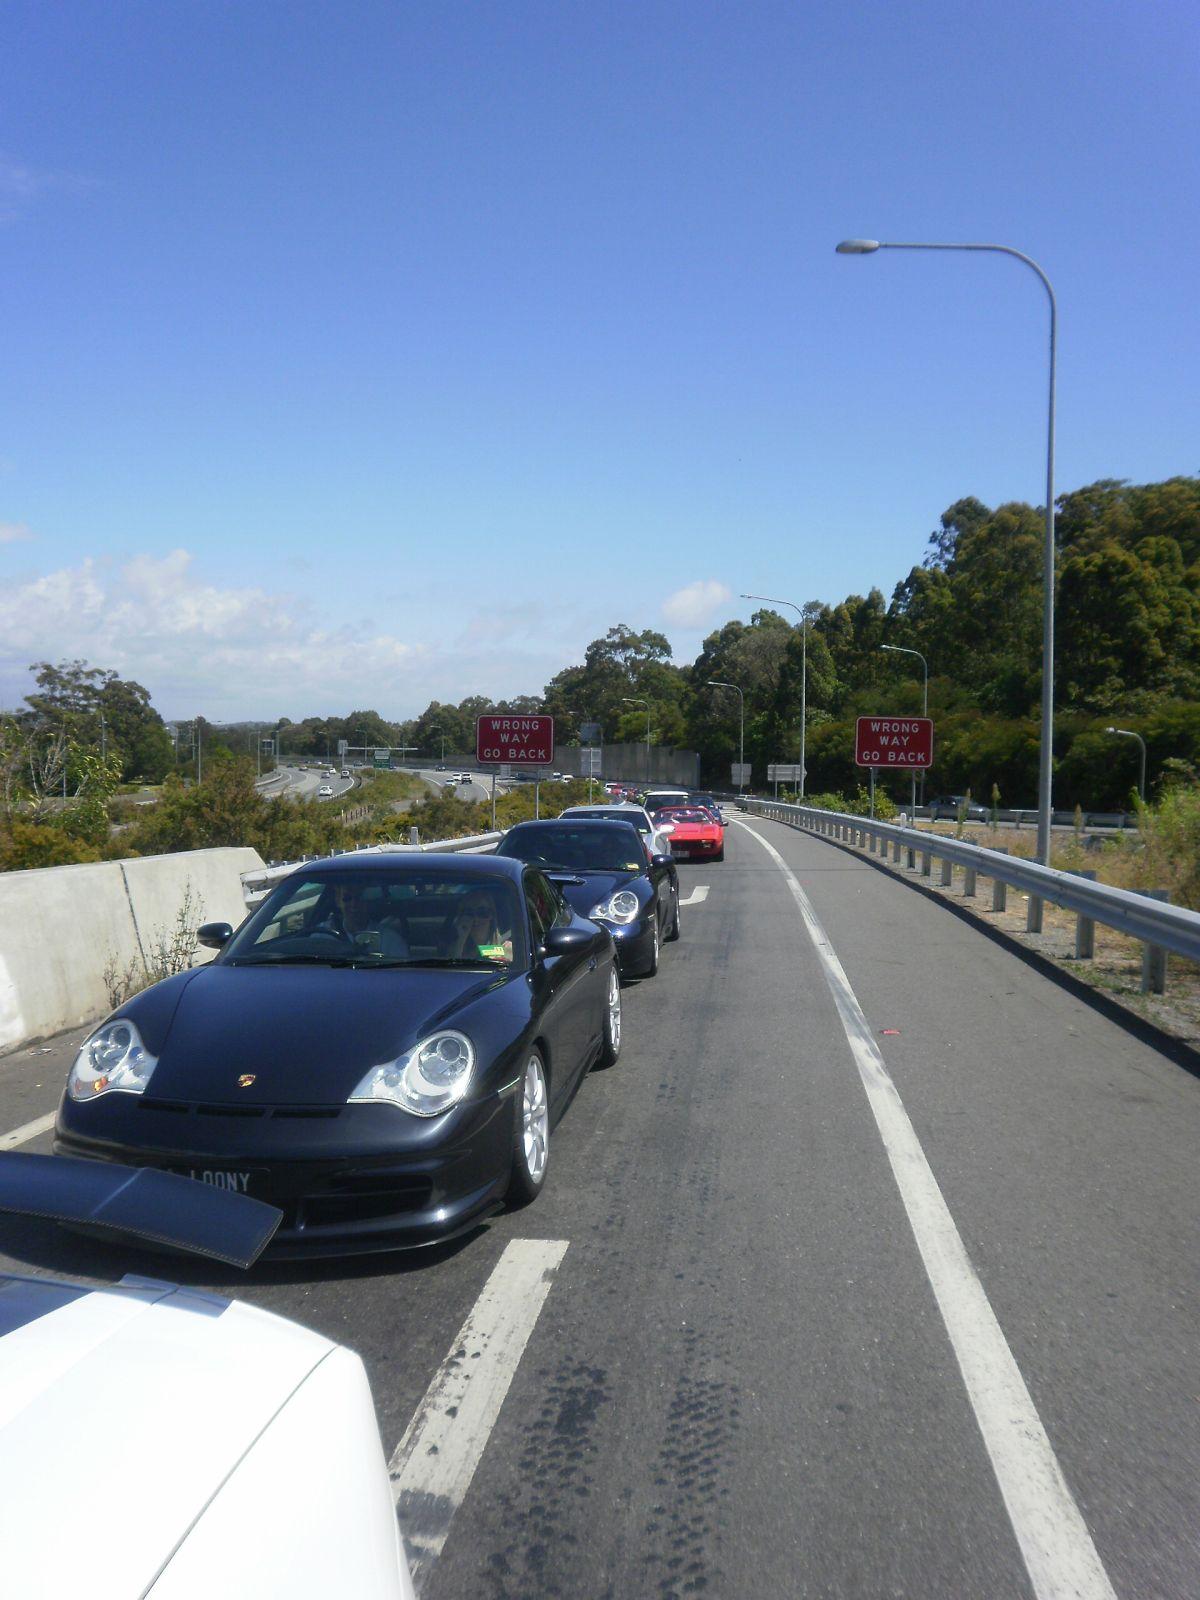 Lamborghini Gallardo Lp560 4 Review | For Sale | Australia | Buy & Sell